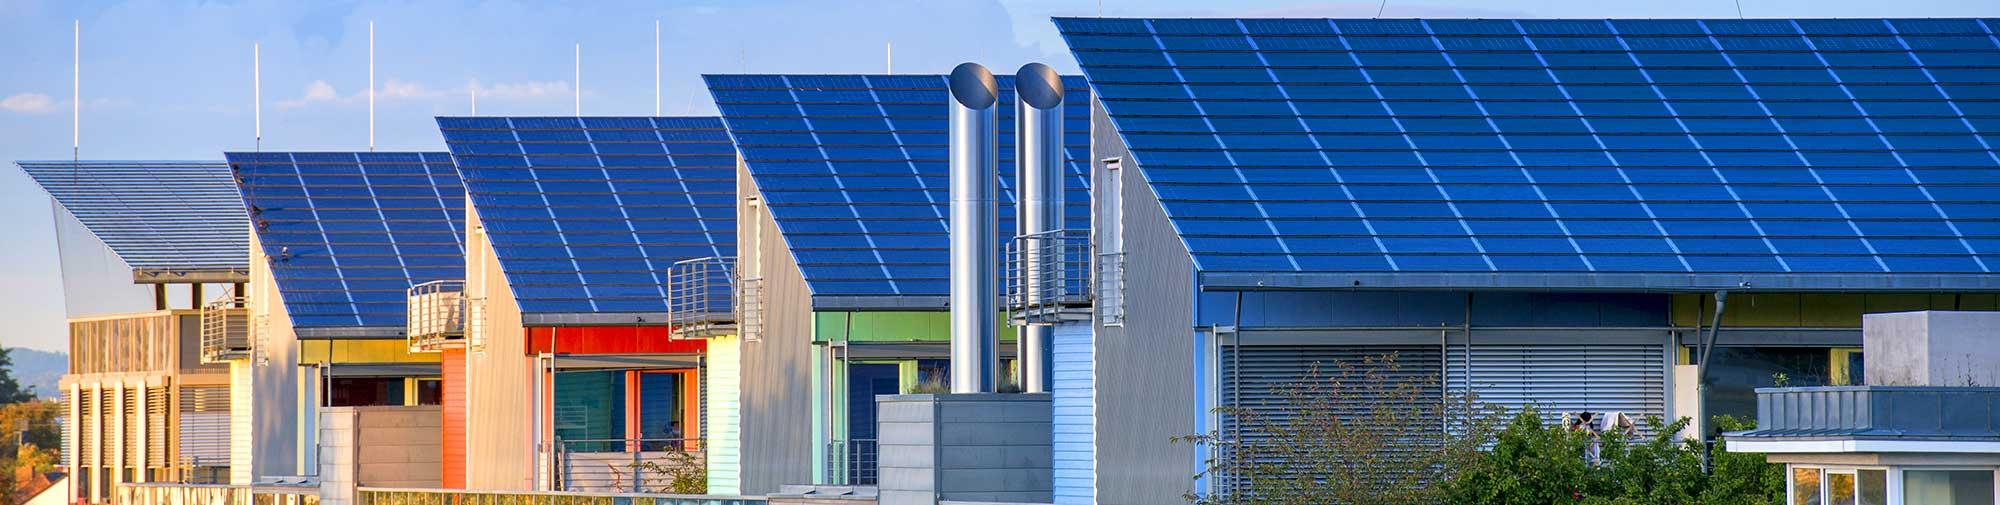 Rendre sa maison colo mode d emploi total direct energie - Rendre sa maison autonome ...